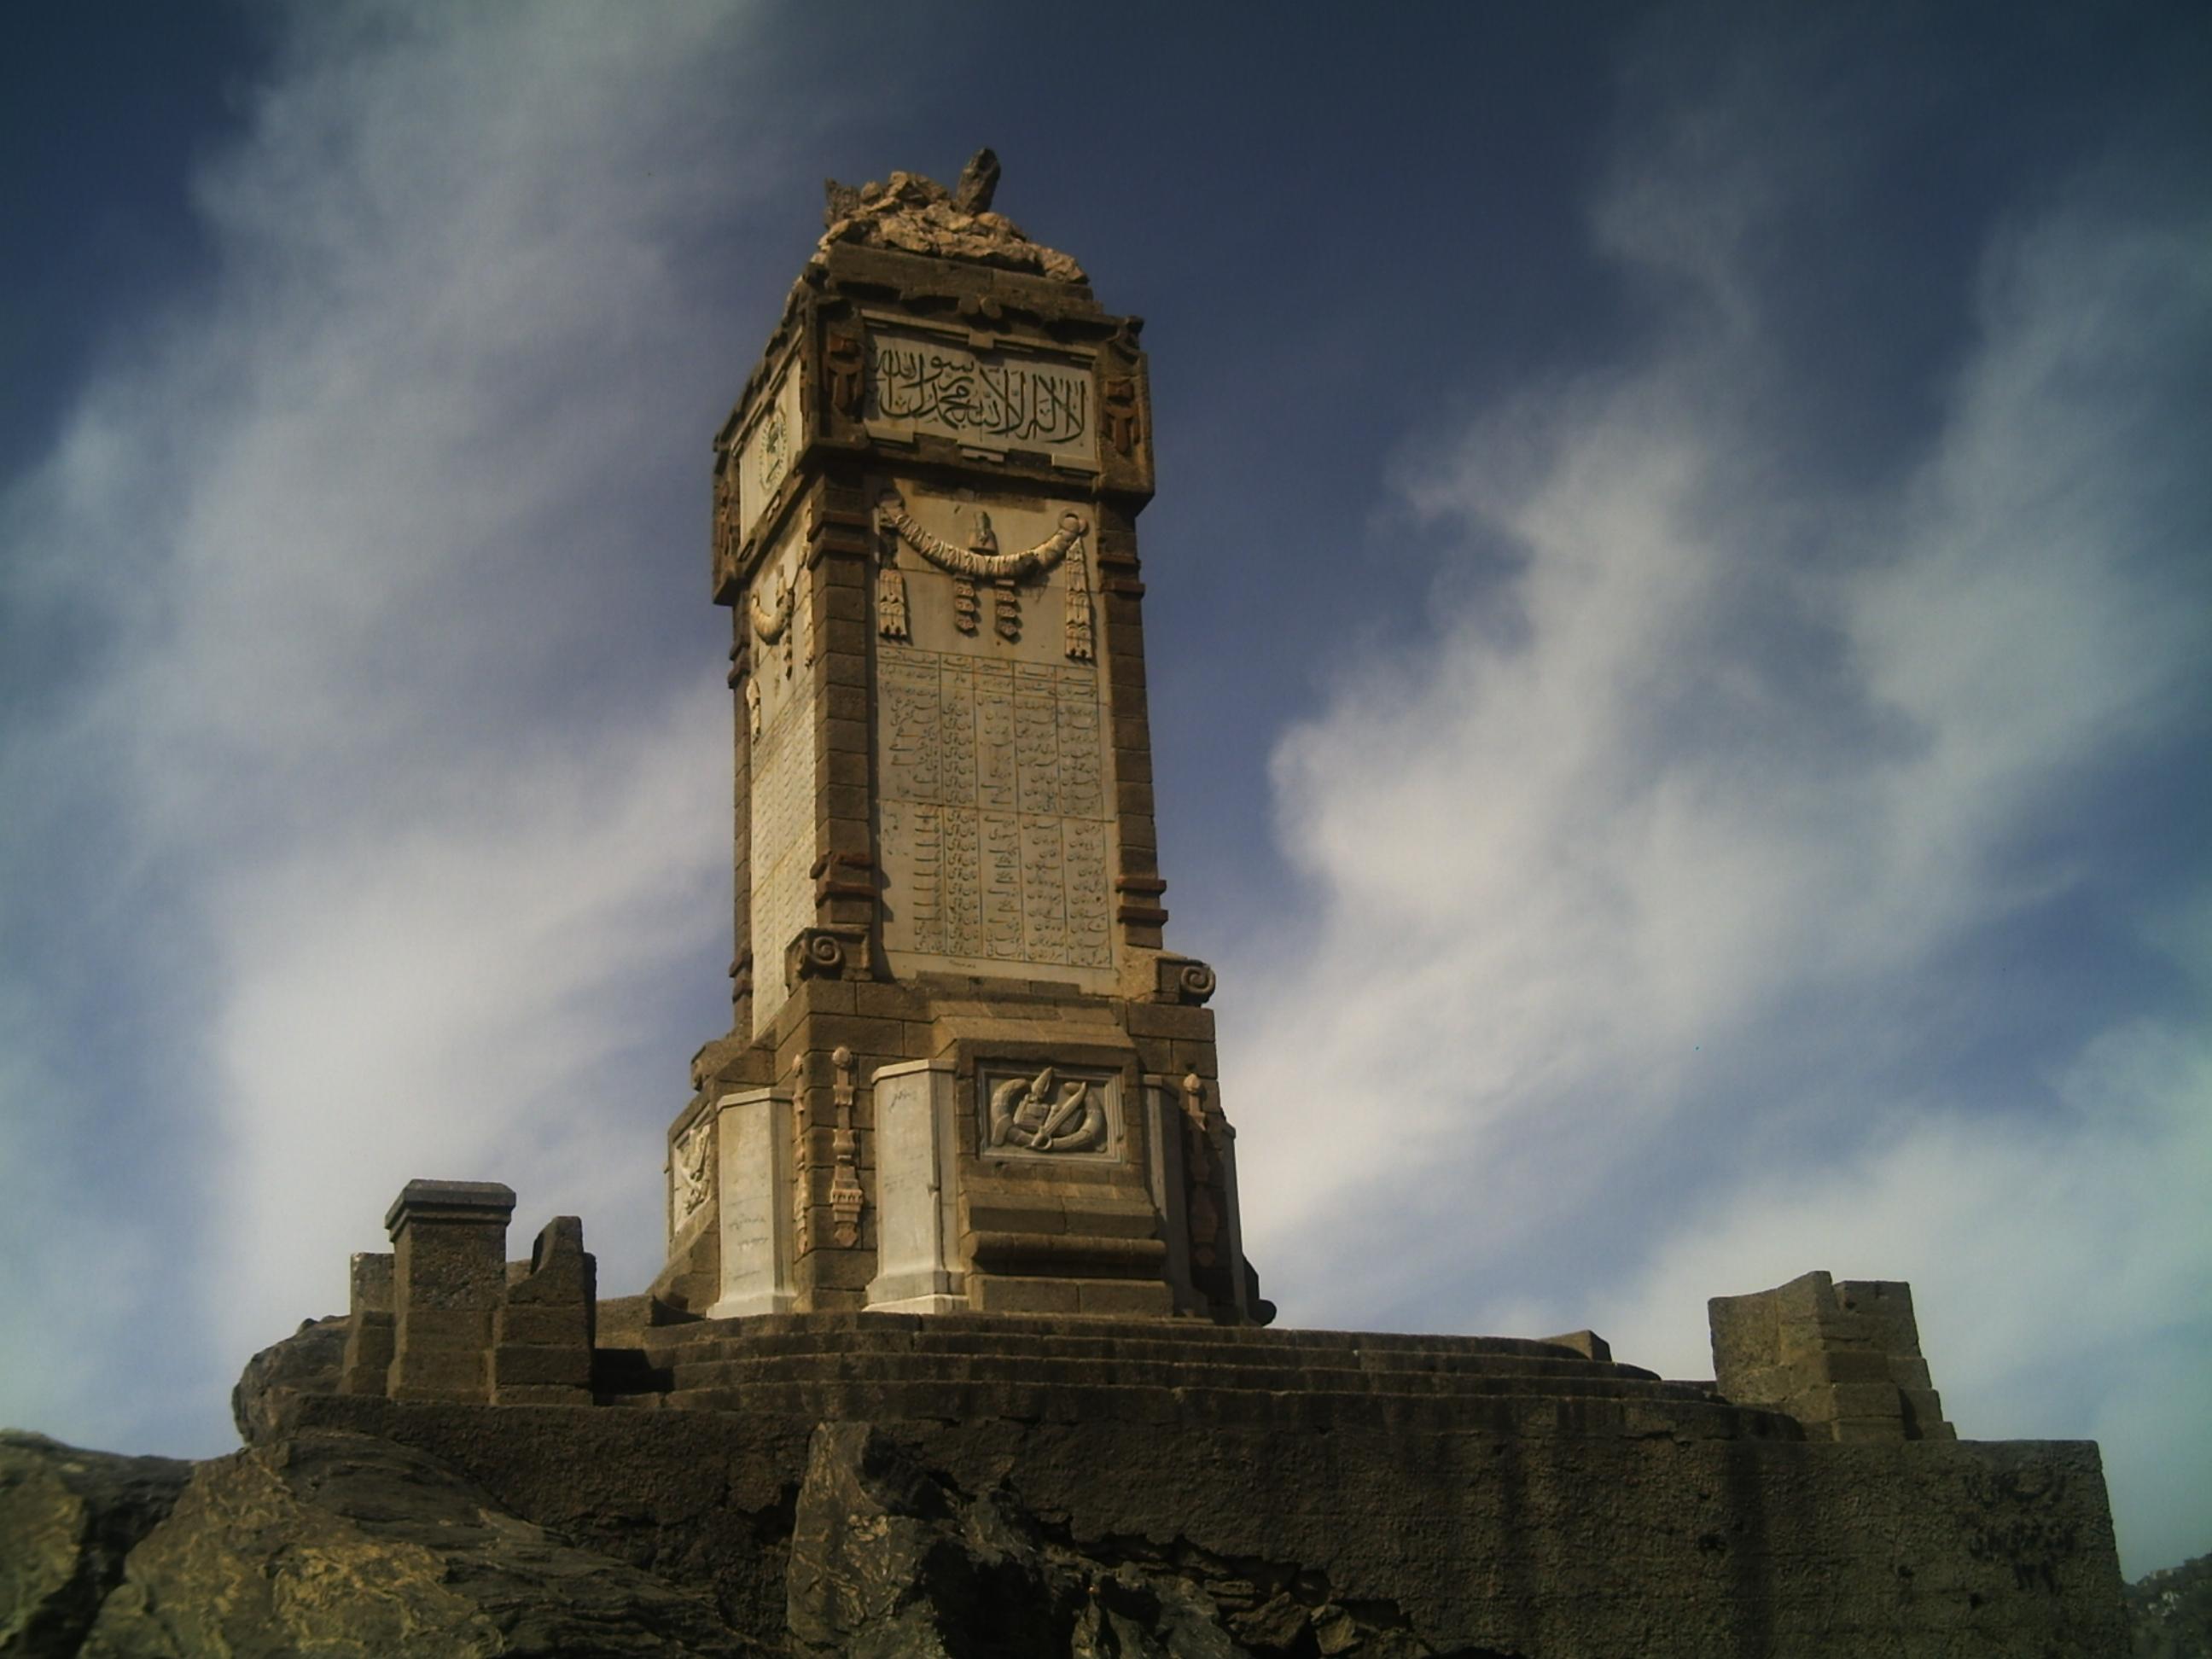 Ilm-o-Jahal Minaret